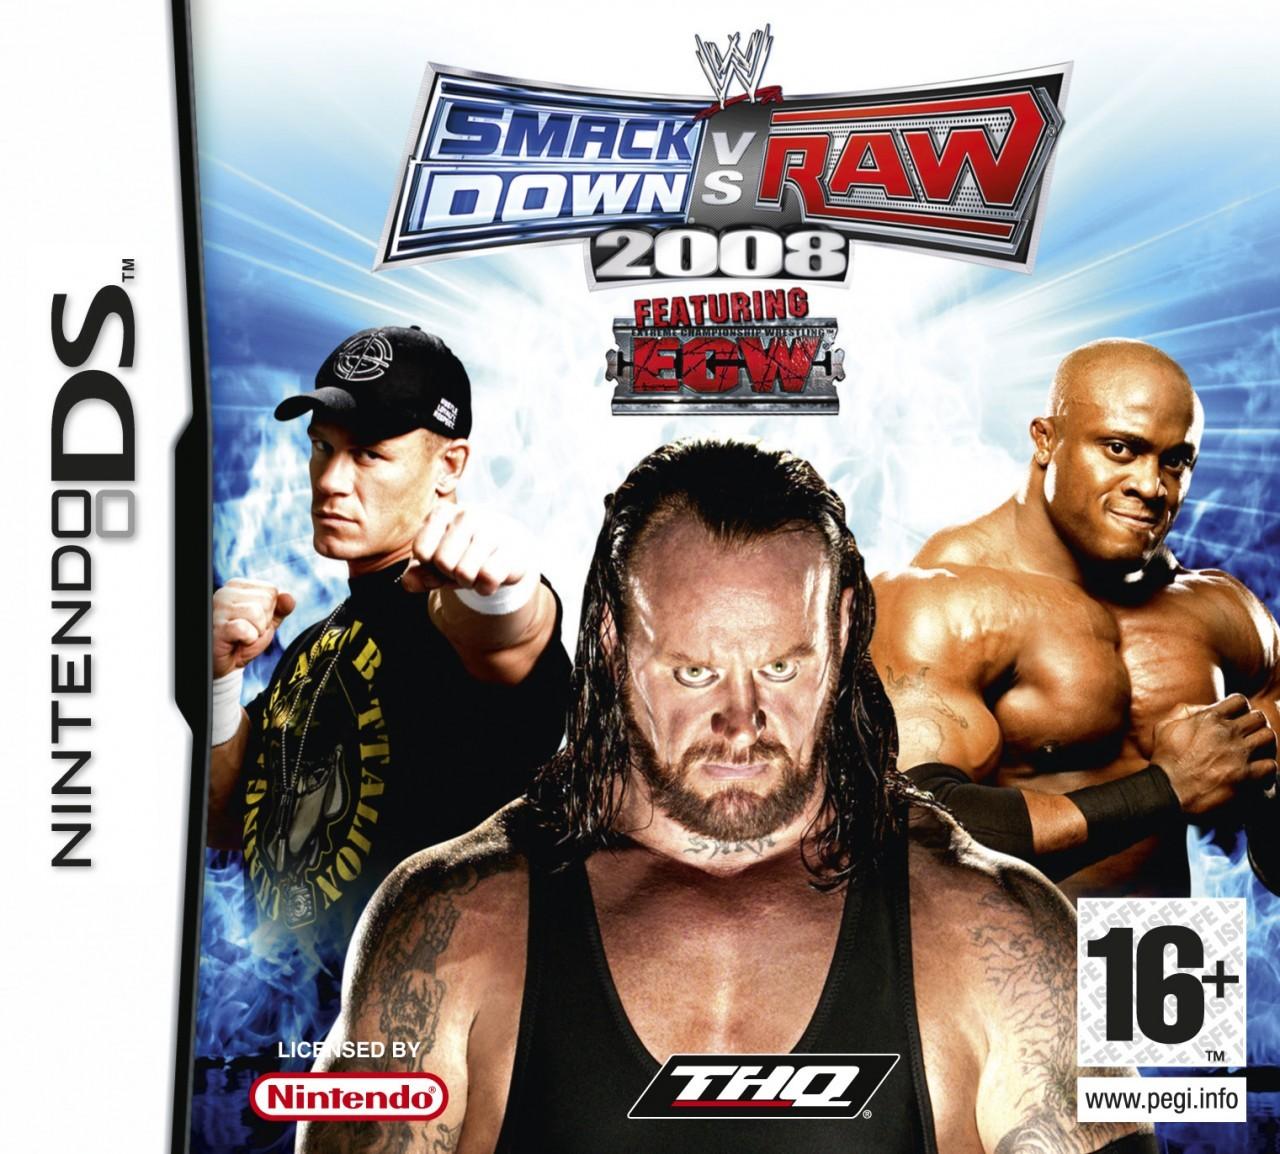 Wwe Smackdown Vs Raw 2007  Hot Girl Hd Wallpaper-2064